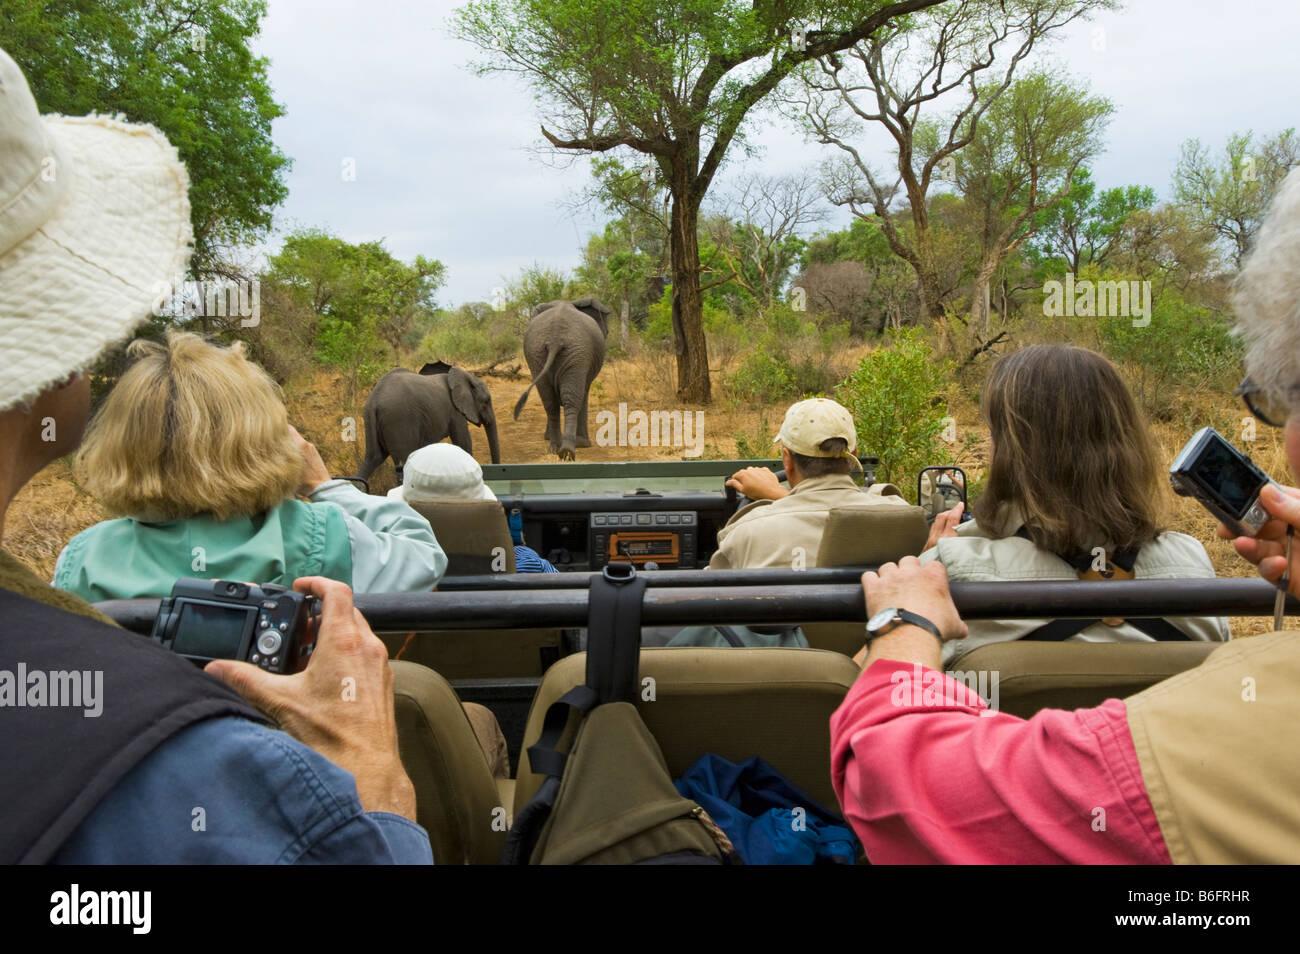 Pirschfahrt Abenteuer Südafrika Jeep Fahrzeug Menschen SAFARI Auto Bus Kleinbus Süd-Afrika Elefant Kreuzung Stockbild